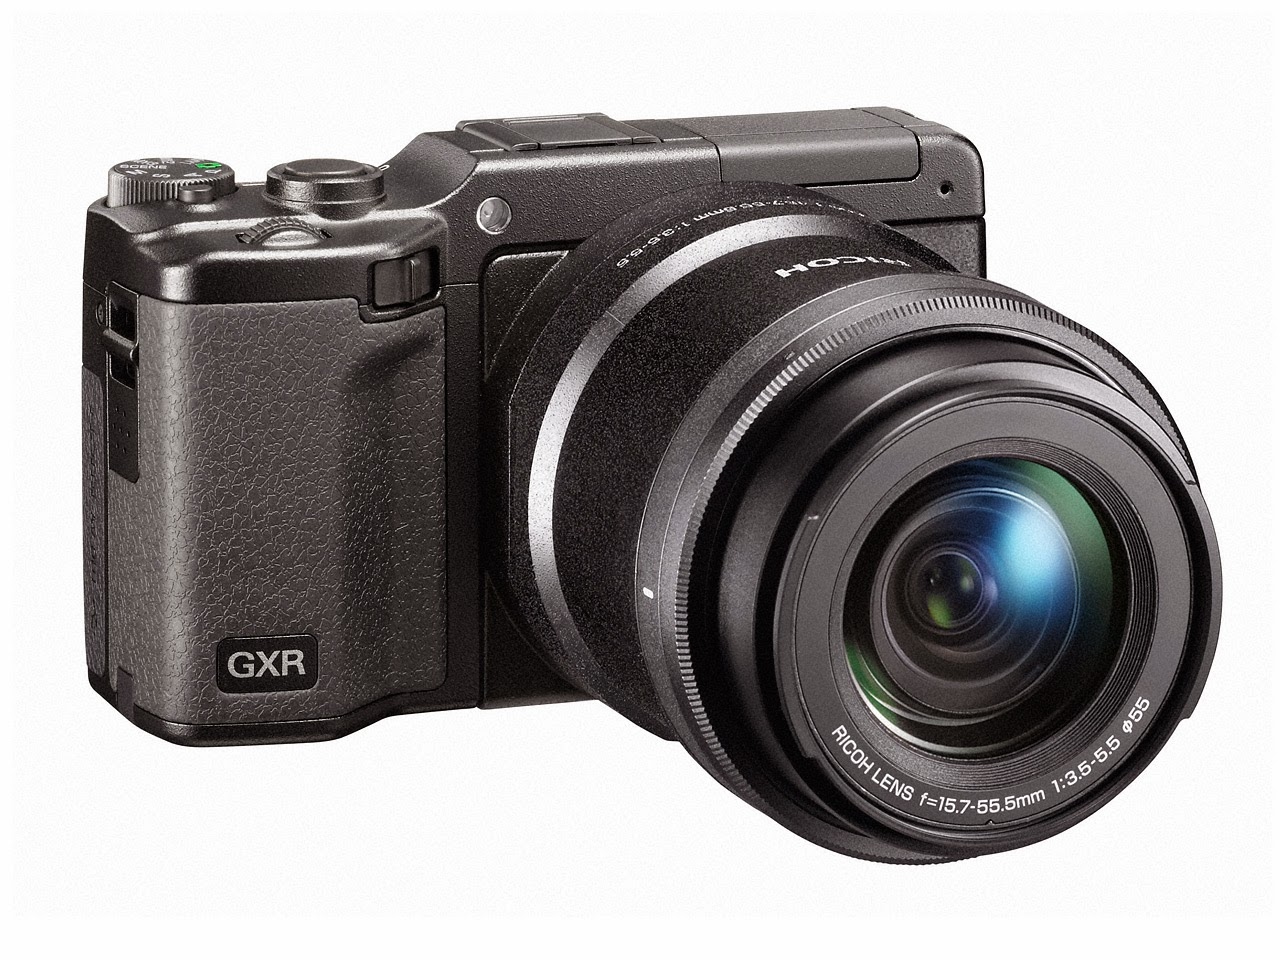 Harga Kamera Ricoh Gxr A16 Terbaru Dan Spesifikasi